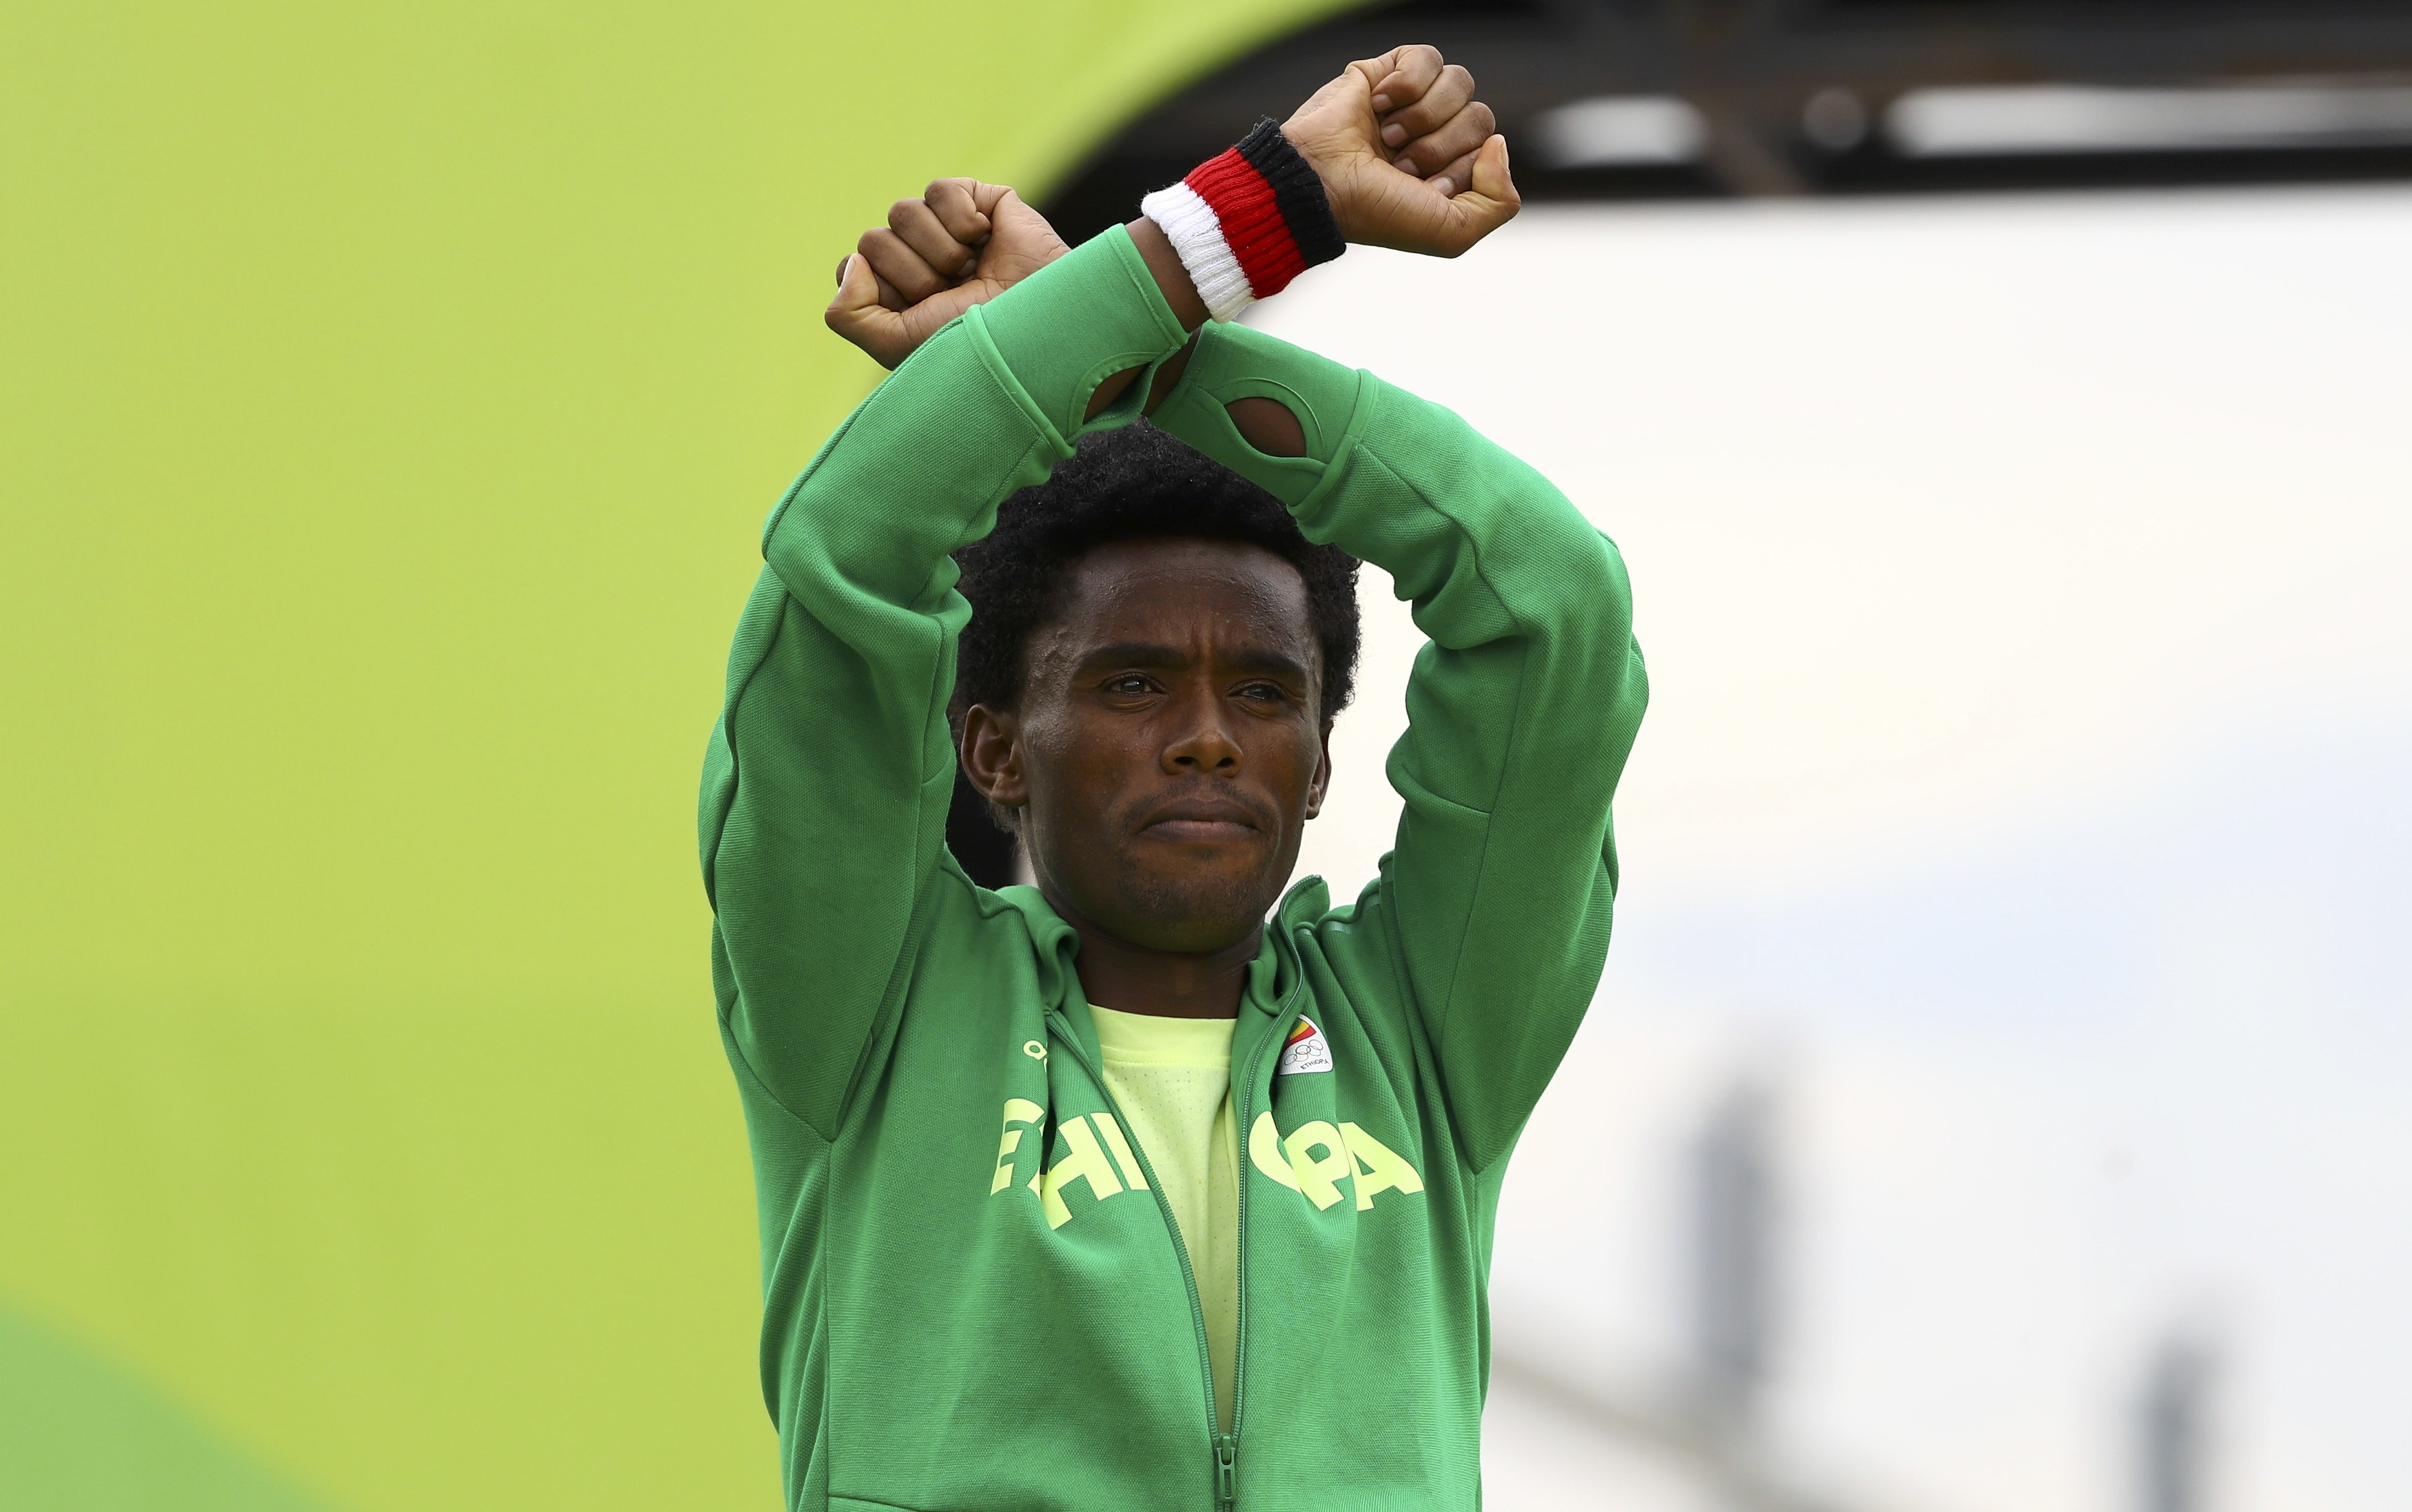 Ethiopia's Feyisa Lilesa crosses his wrists to protest Ethiopian government's crackdown on Oromo people.